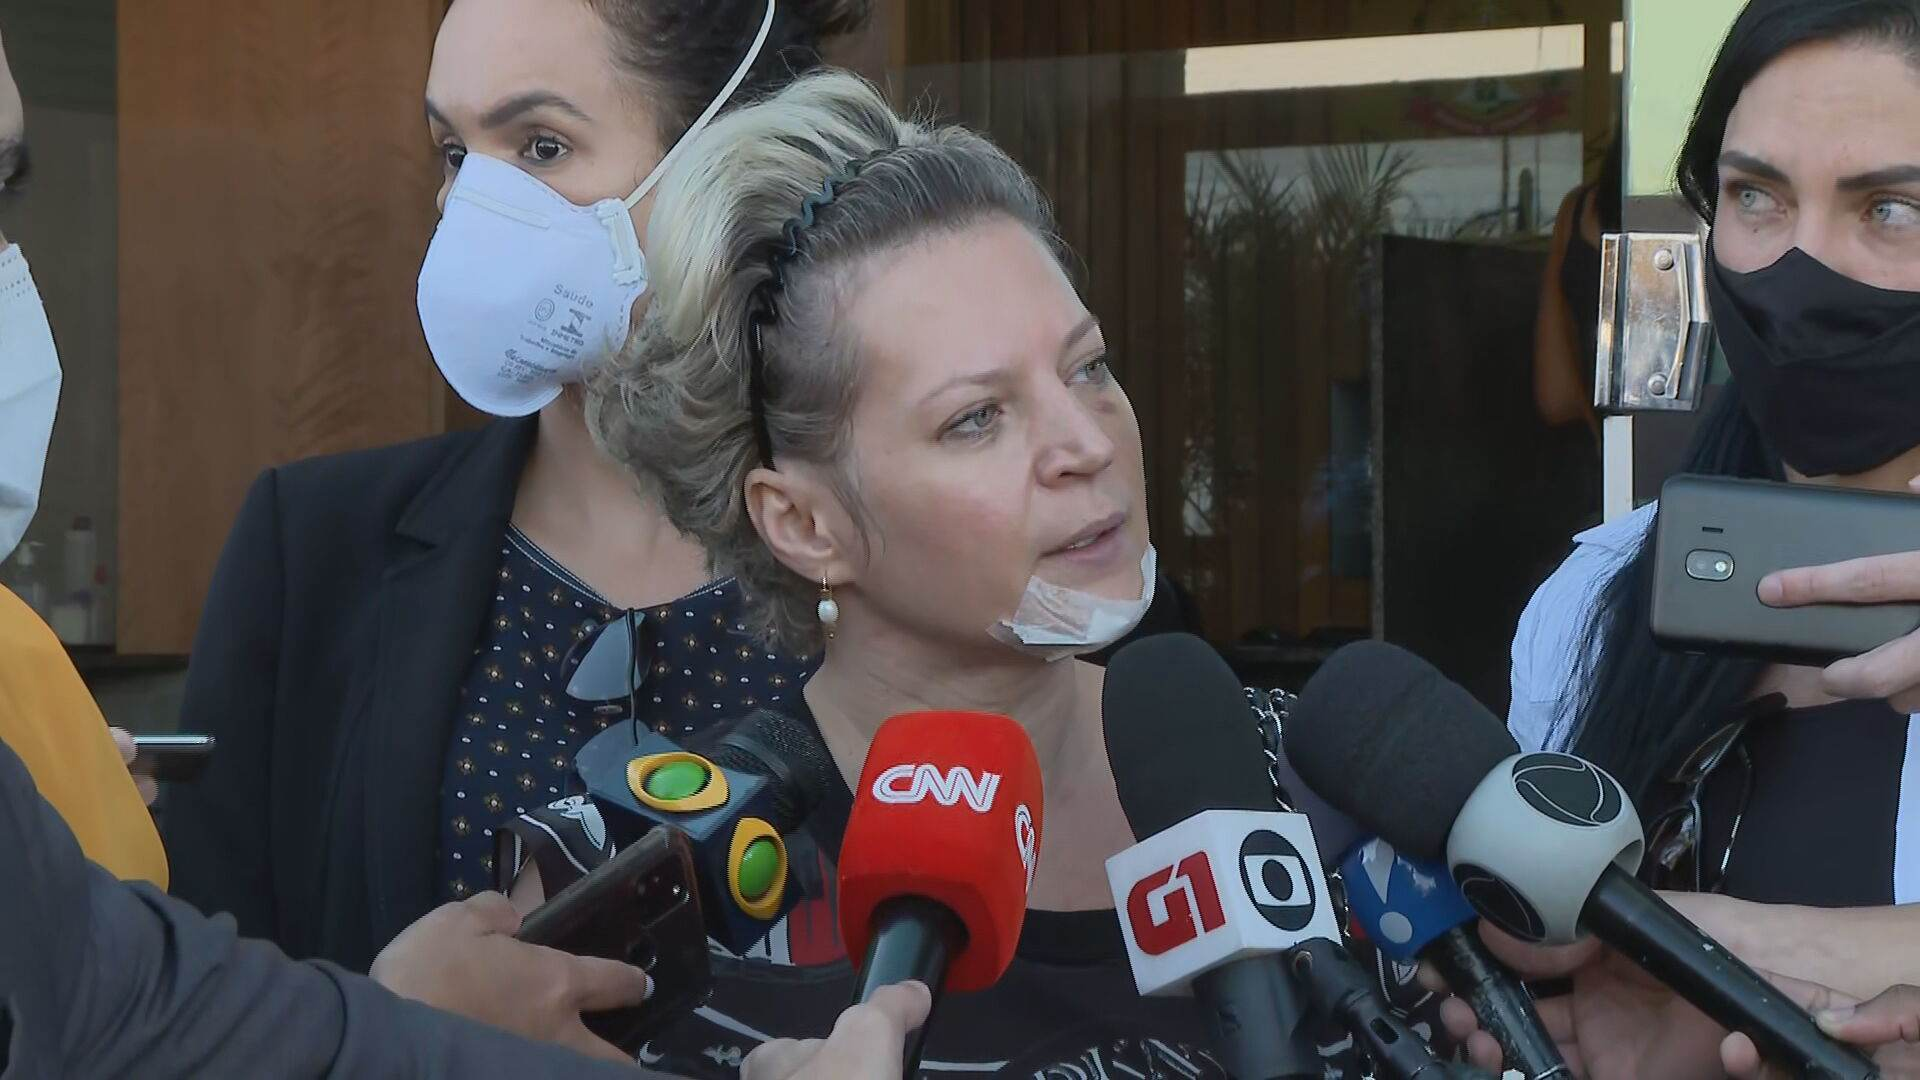 Deputada federal Joice Hasselmann (PSL-SP) falou com a imprensa